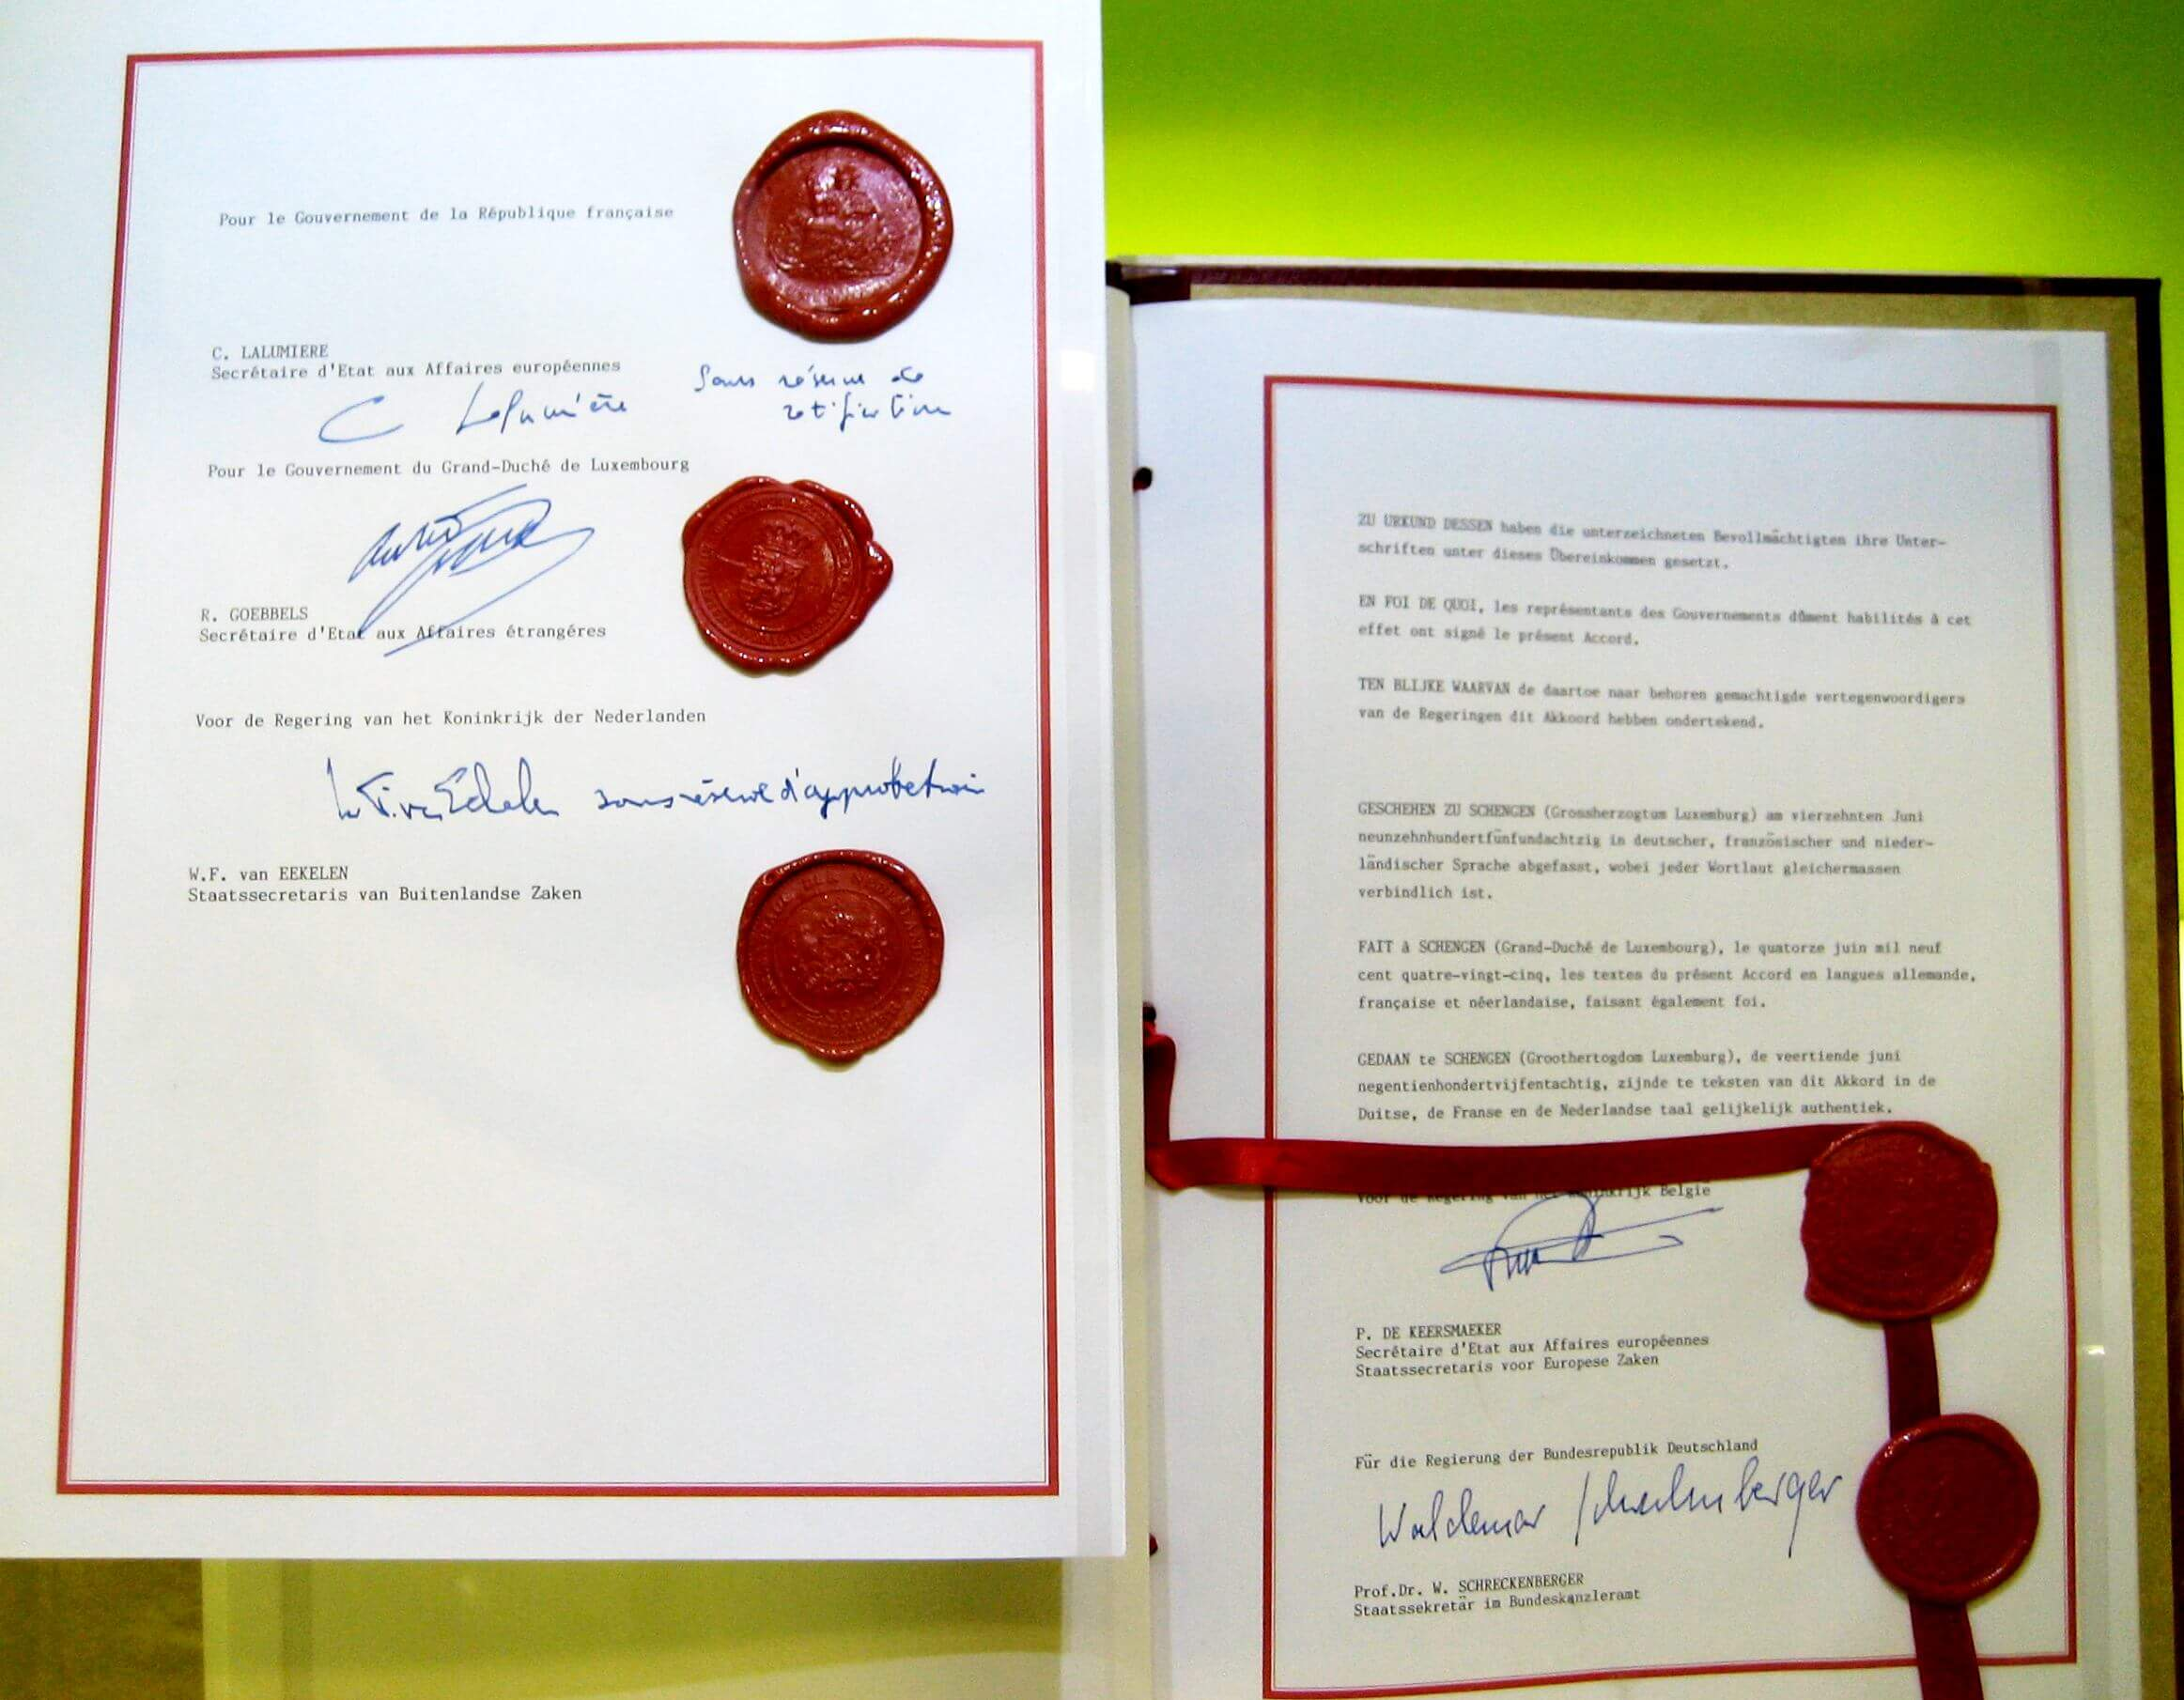 An image showing the signed original Schengen Agreement